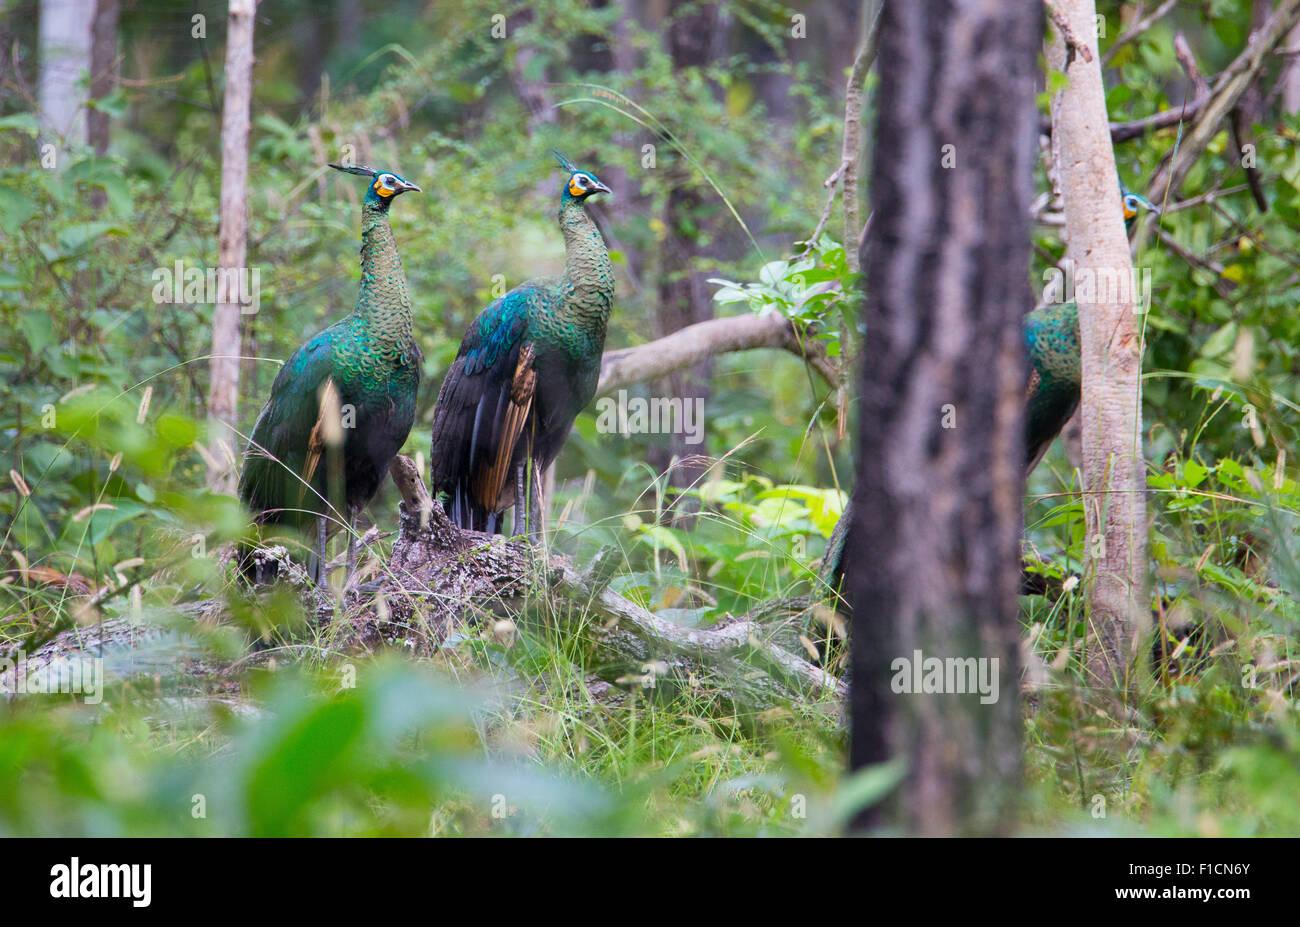 Wild Green Peafowl (Pavo muticus) in Huai Kha Khaeng Wildlife Sanctuary, Thailand - Stock Image